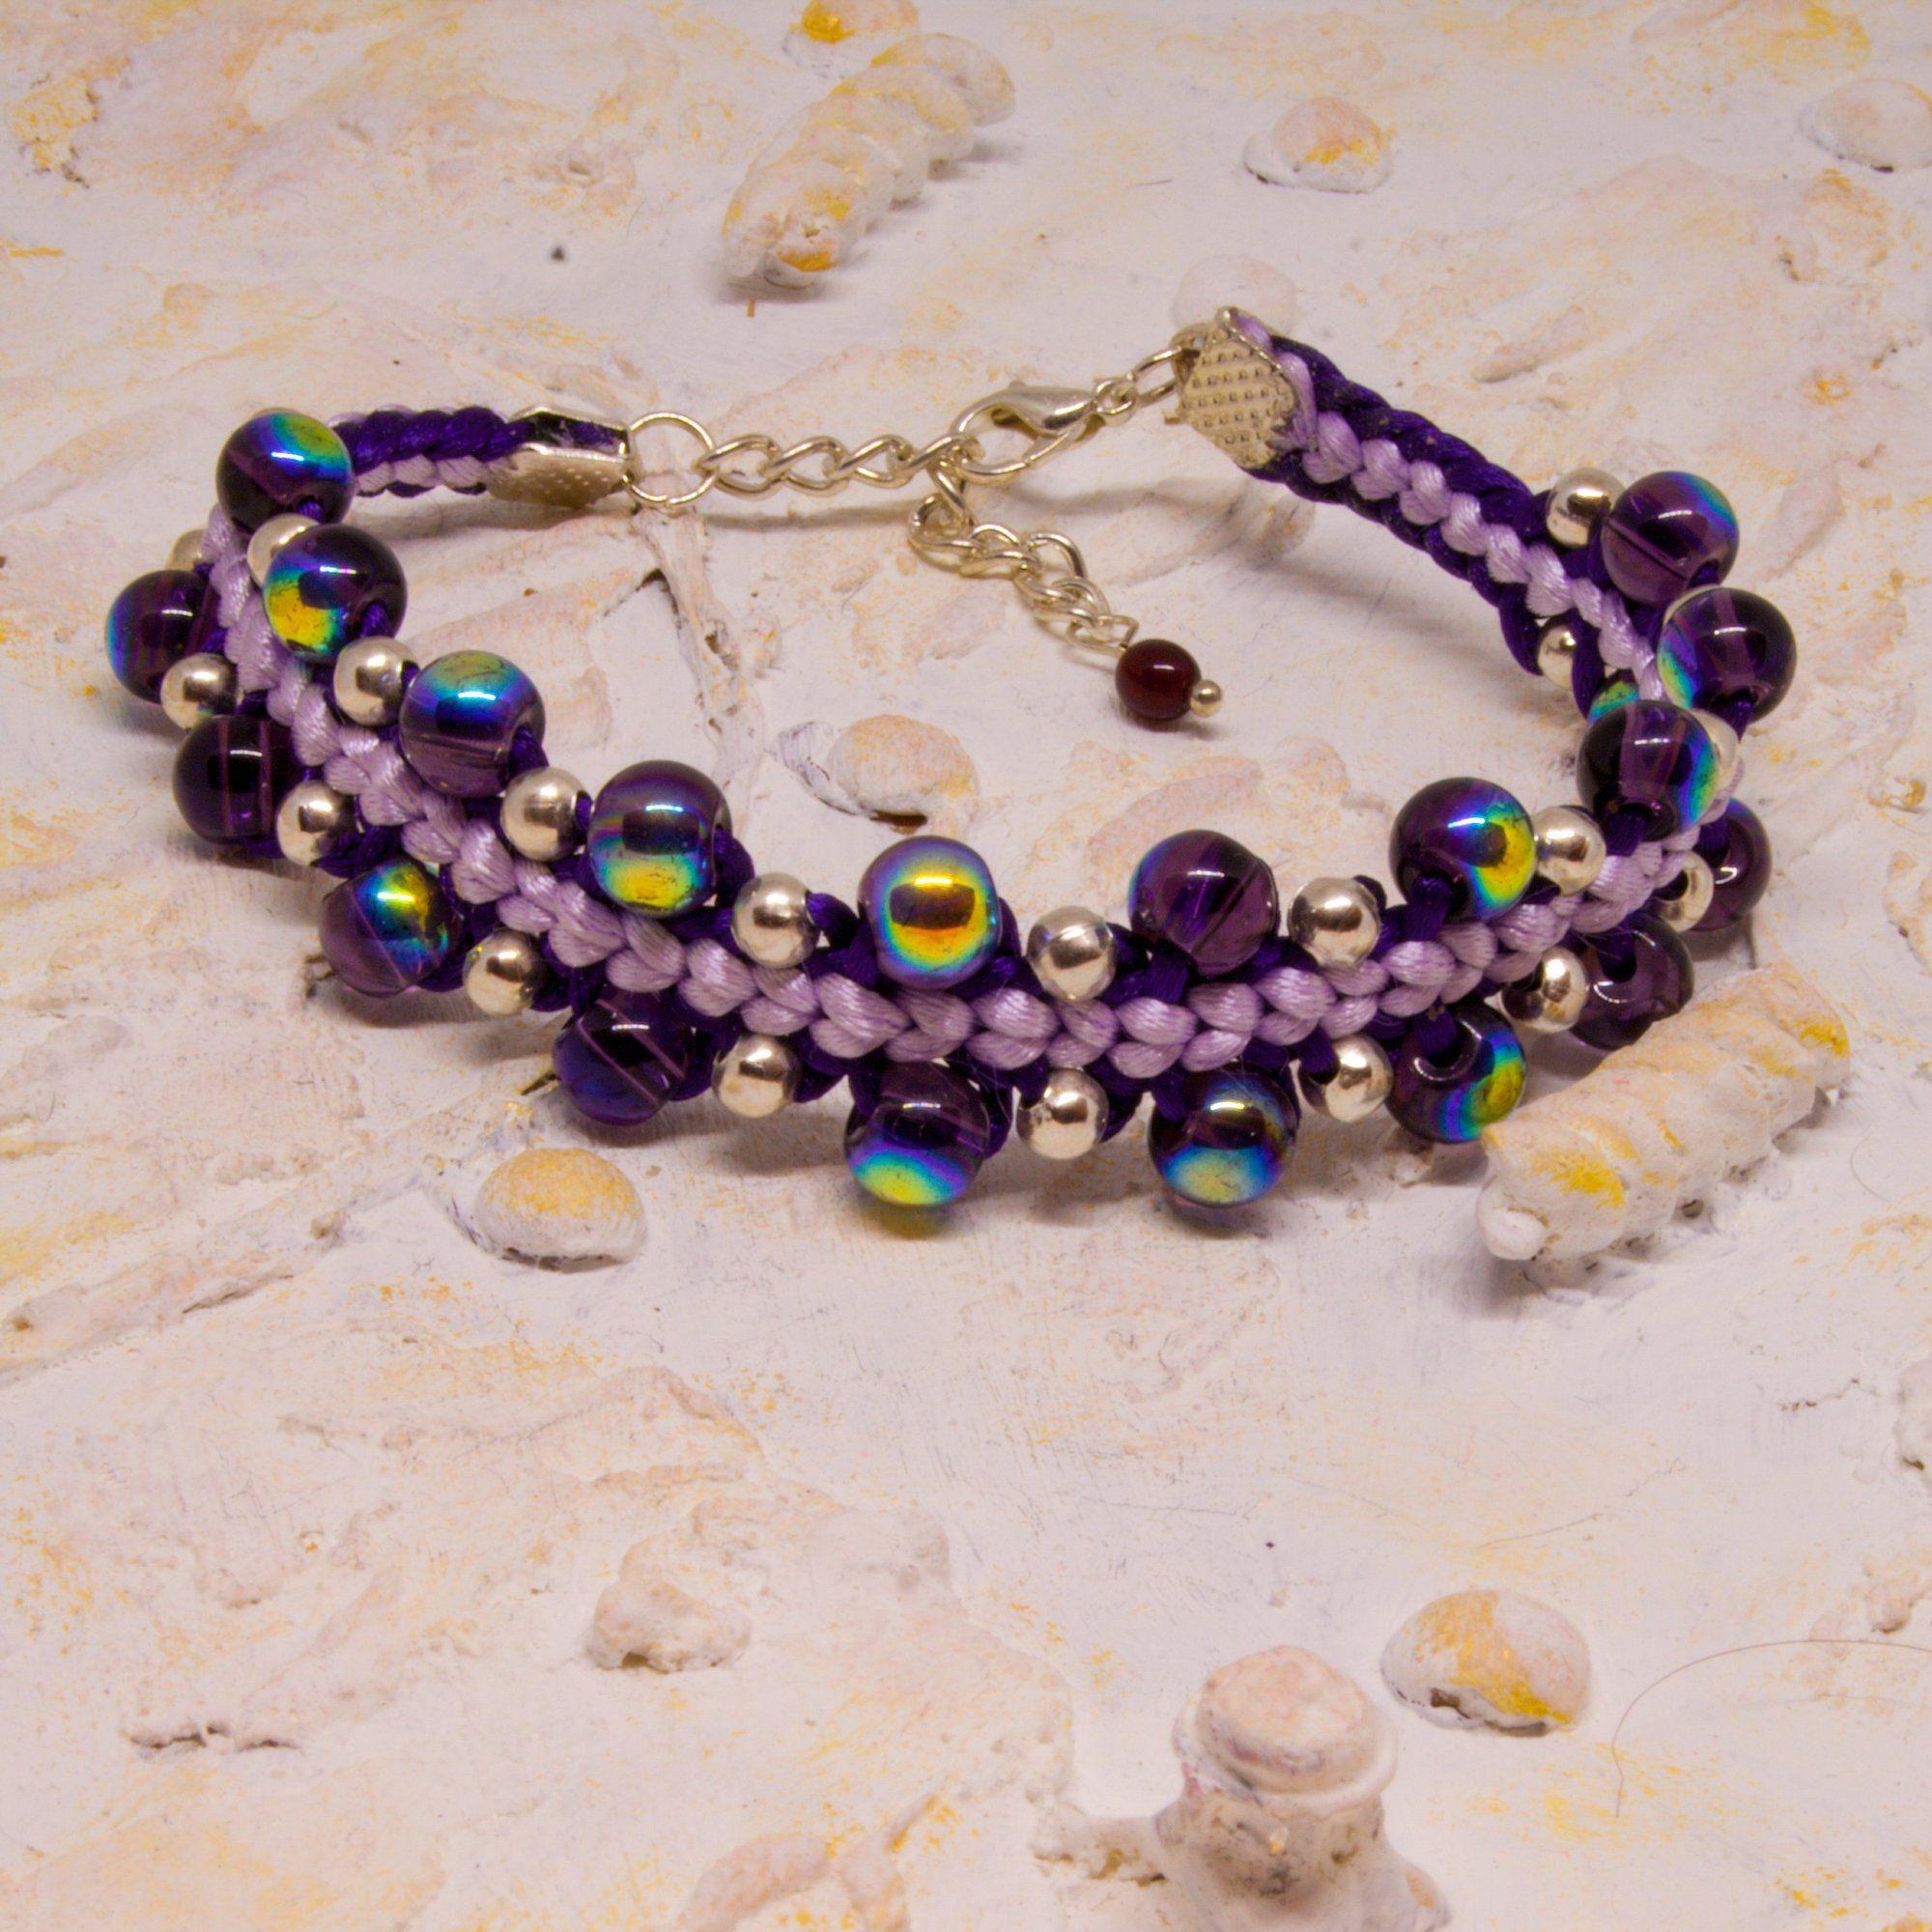 Kumihimo Bracelet Beaded Kumihimo Bracelet Kumihimo Jewellery Multi Coloured Bracelet Ladies Jewellery Friendship gift Handmade gift